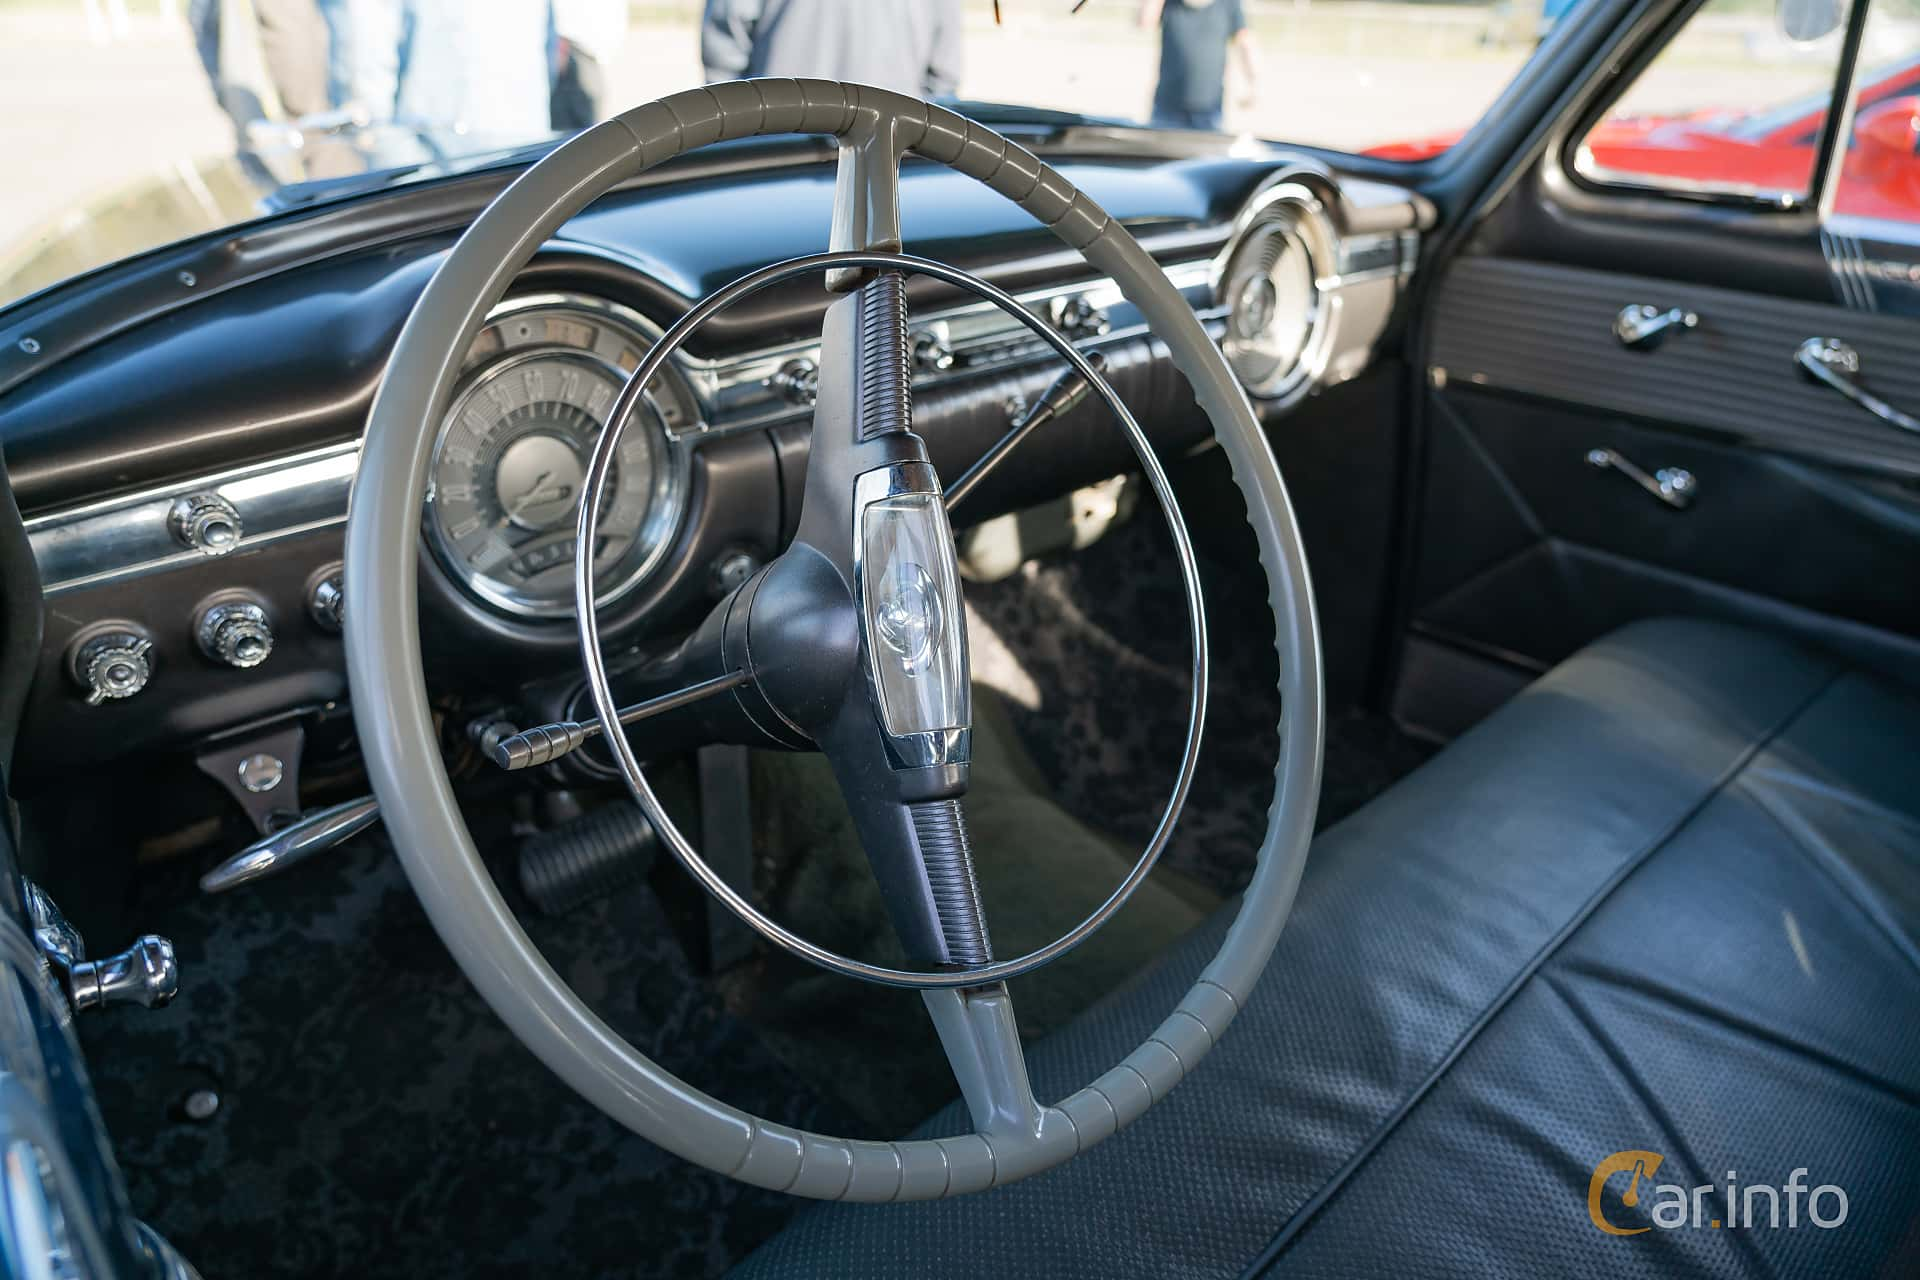 Interior of Oldsmobile Ninety-Eight Sedan 5.0 V8 Hydra-Matic, 167ps, 1953 at Lissma Classic Car 2019 vecka 20